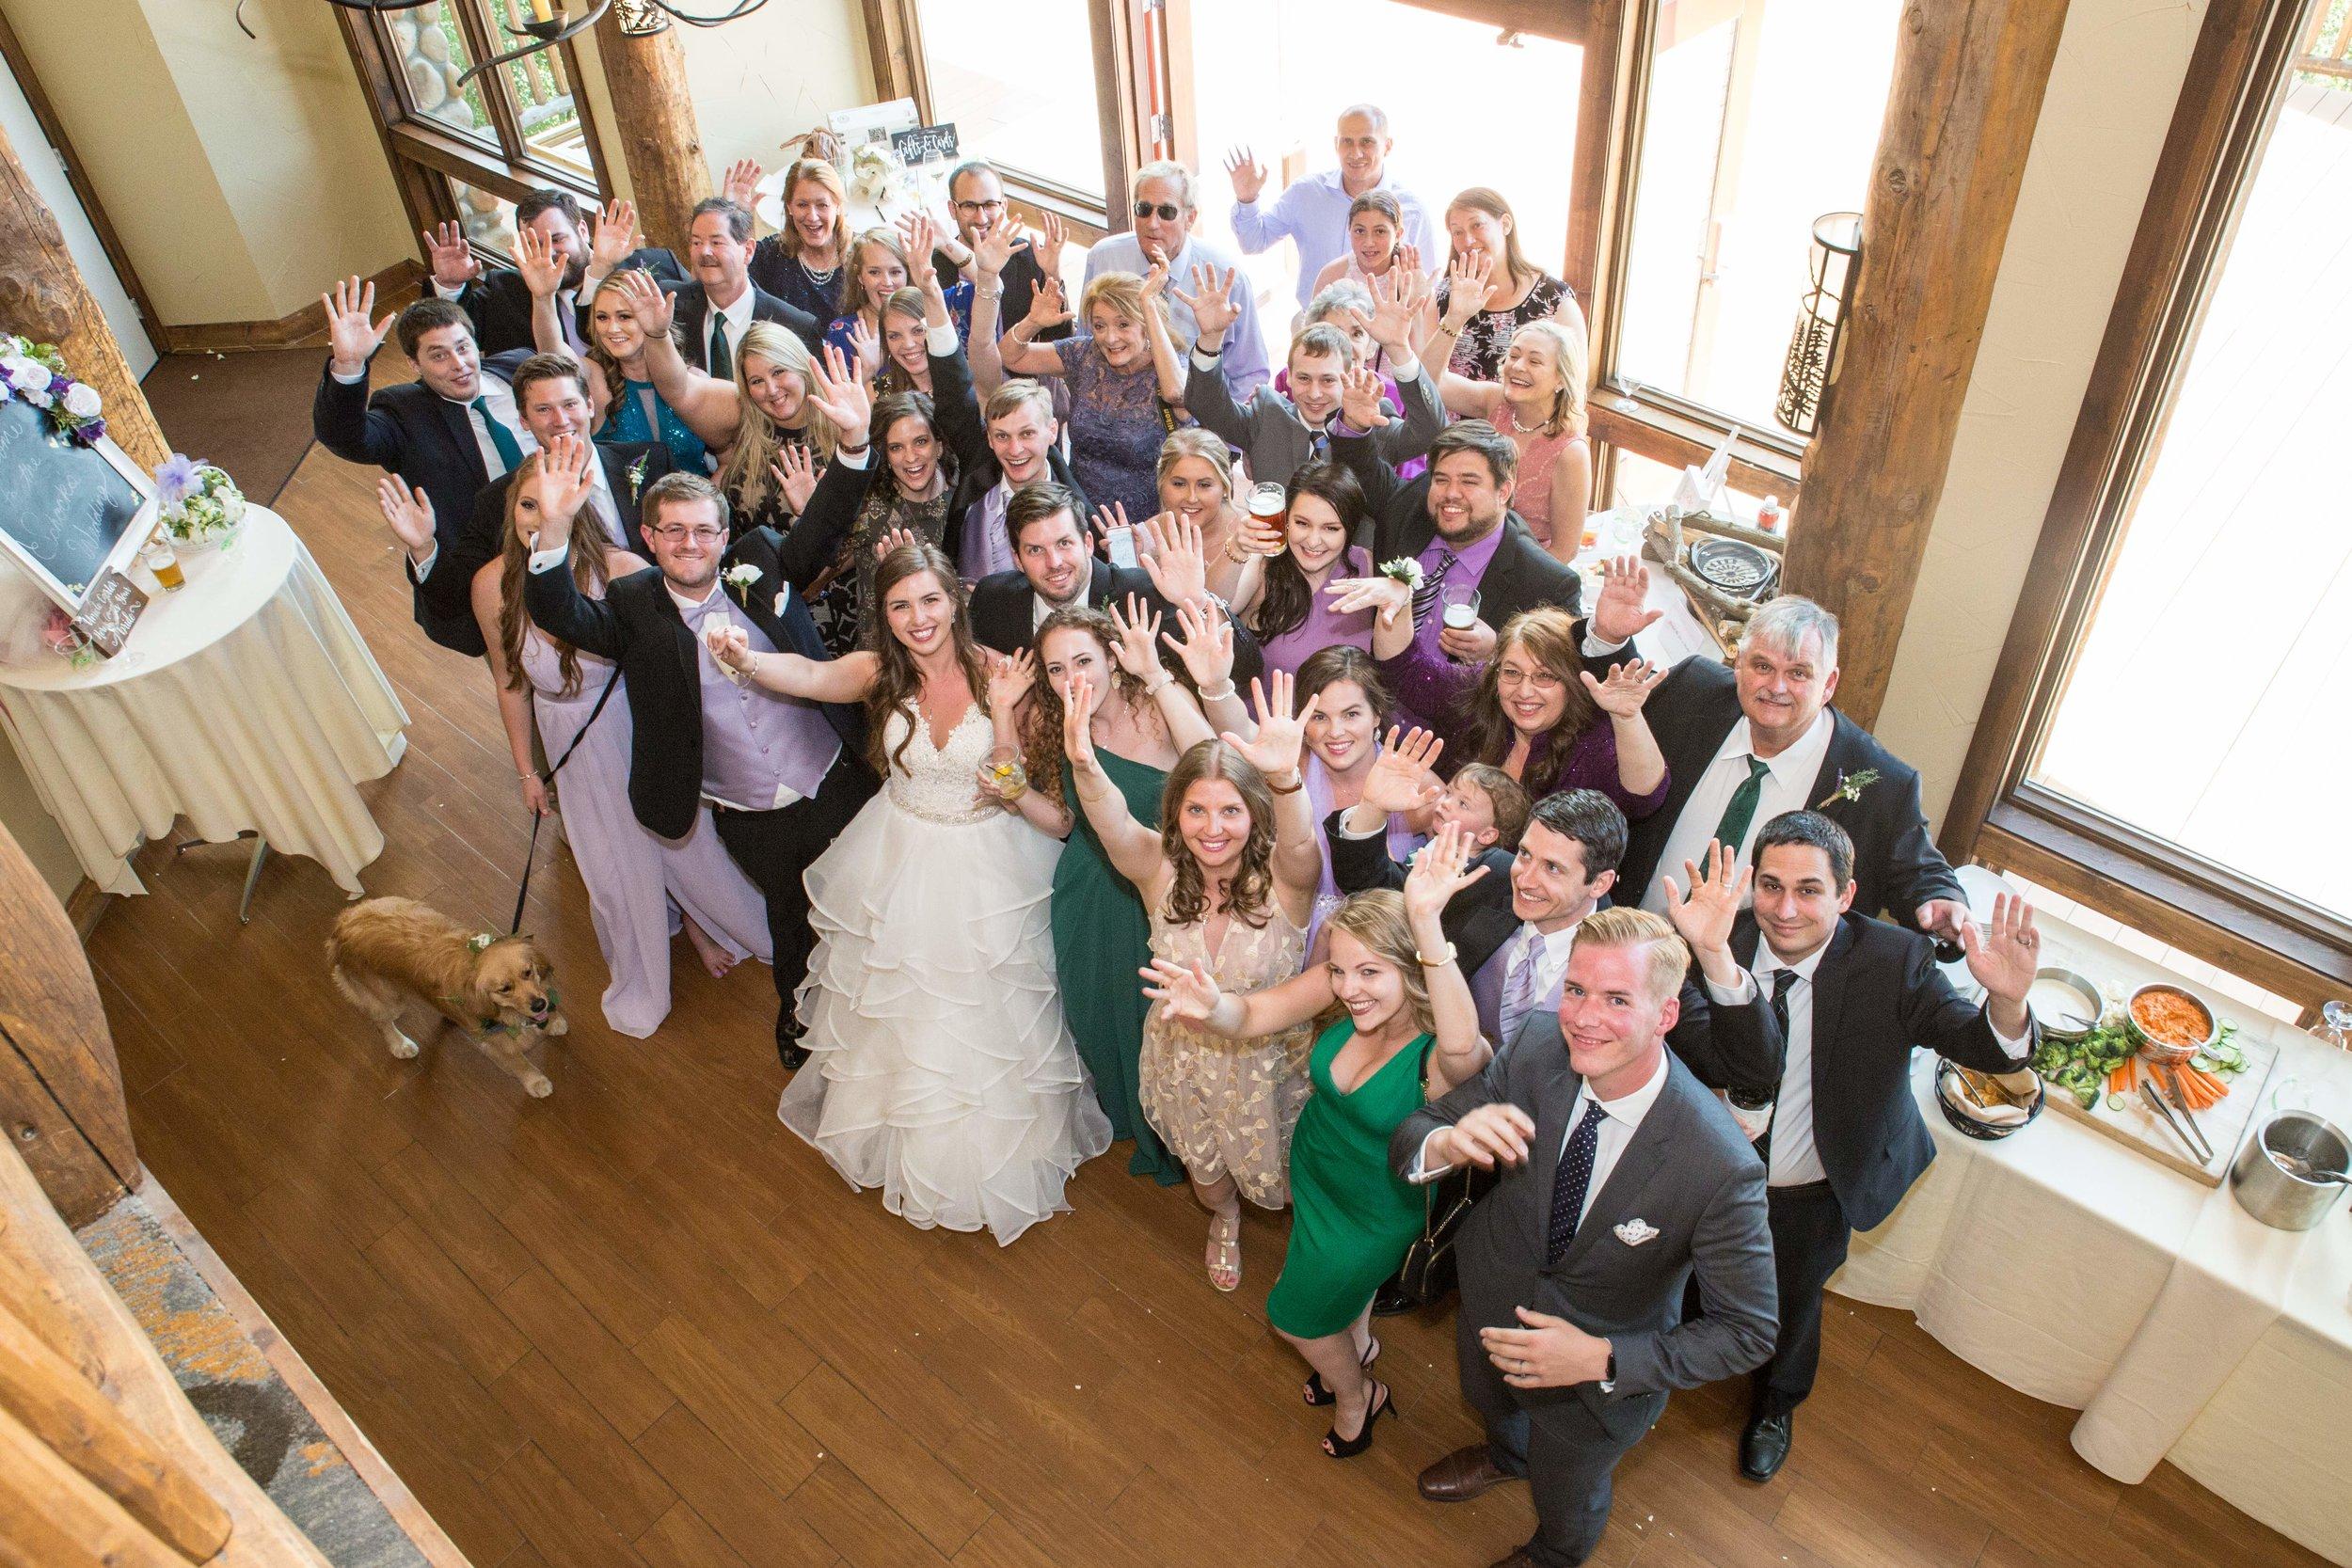 Wedding Guests at The Lodge at Breckenridge